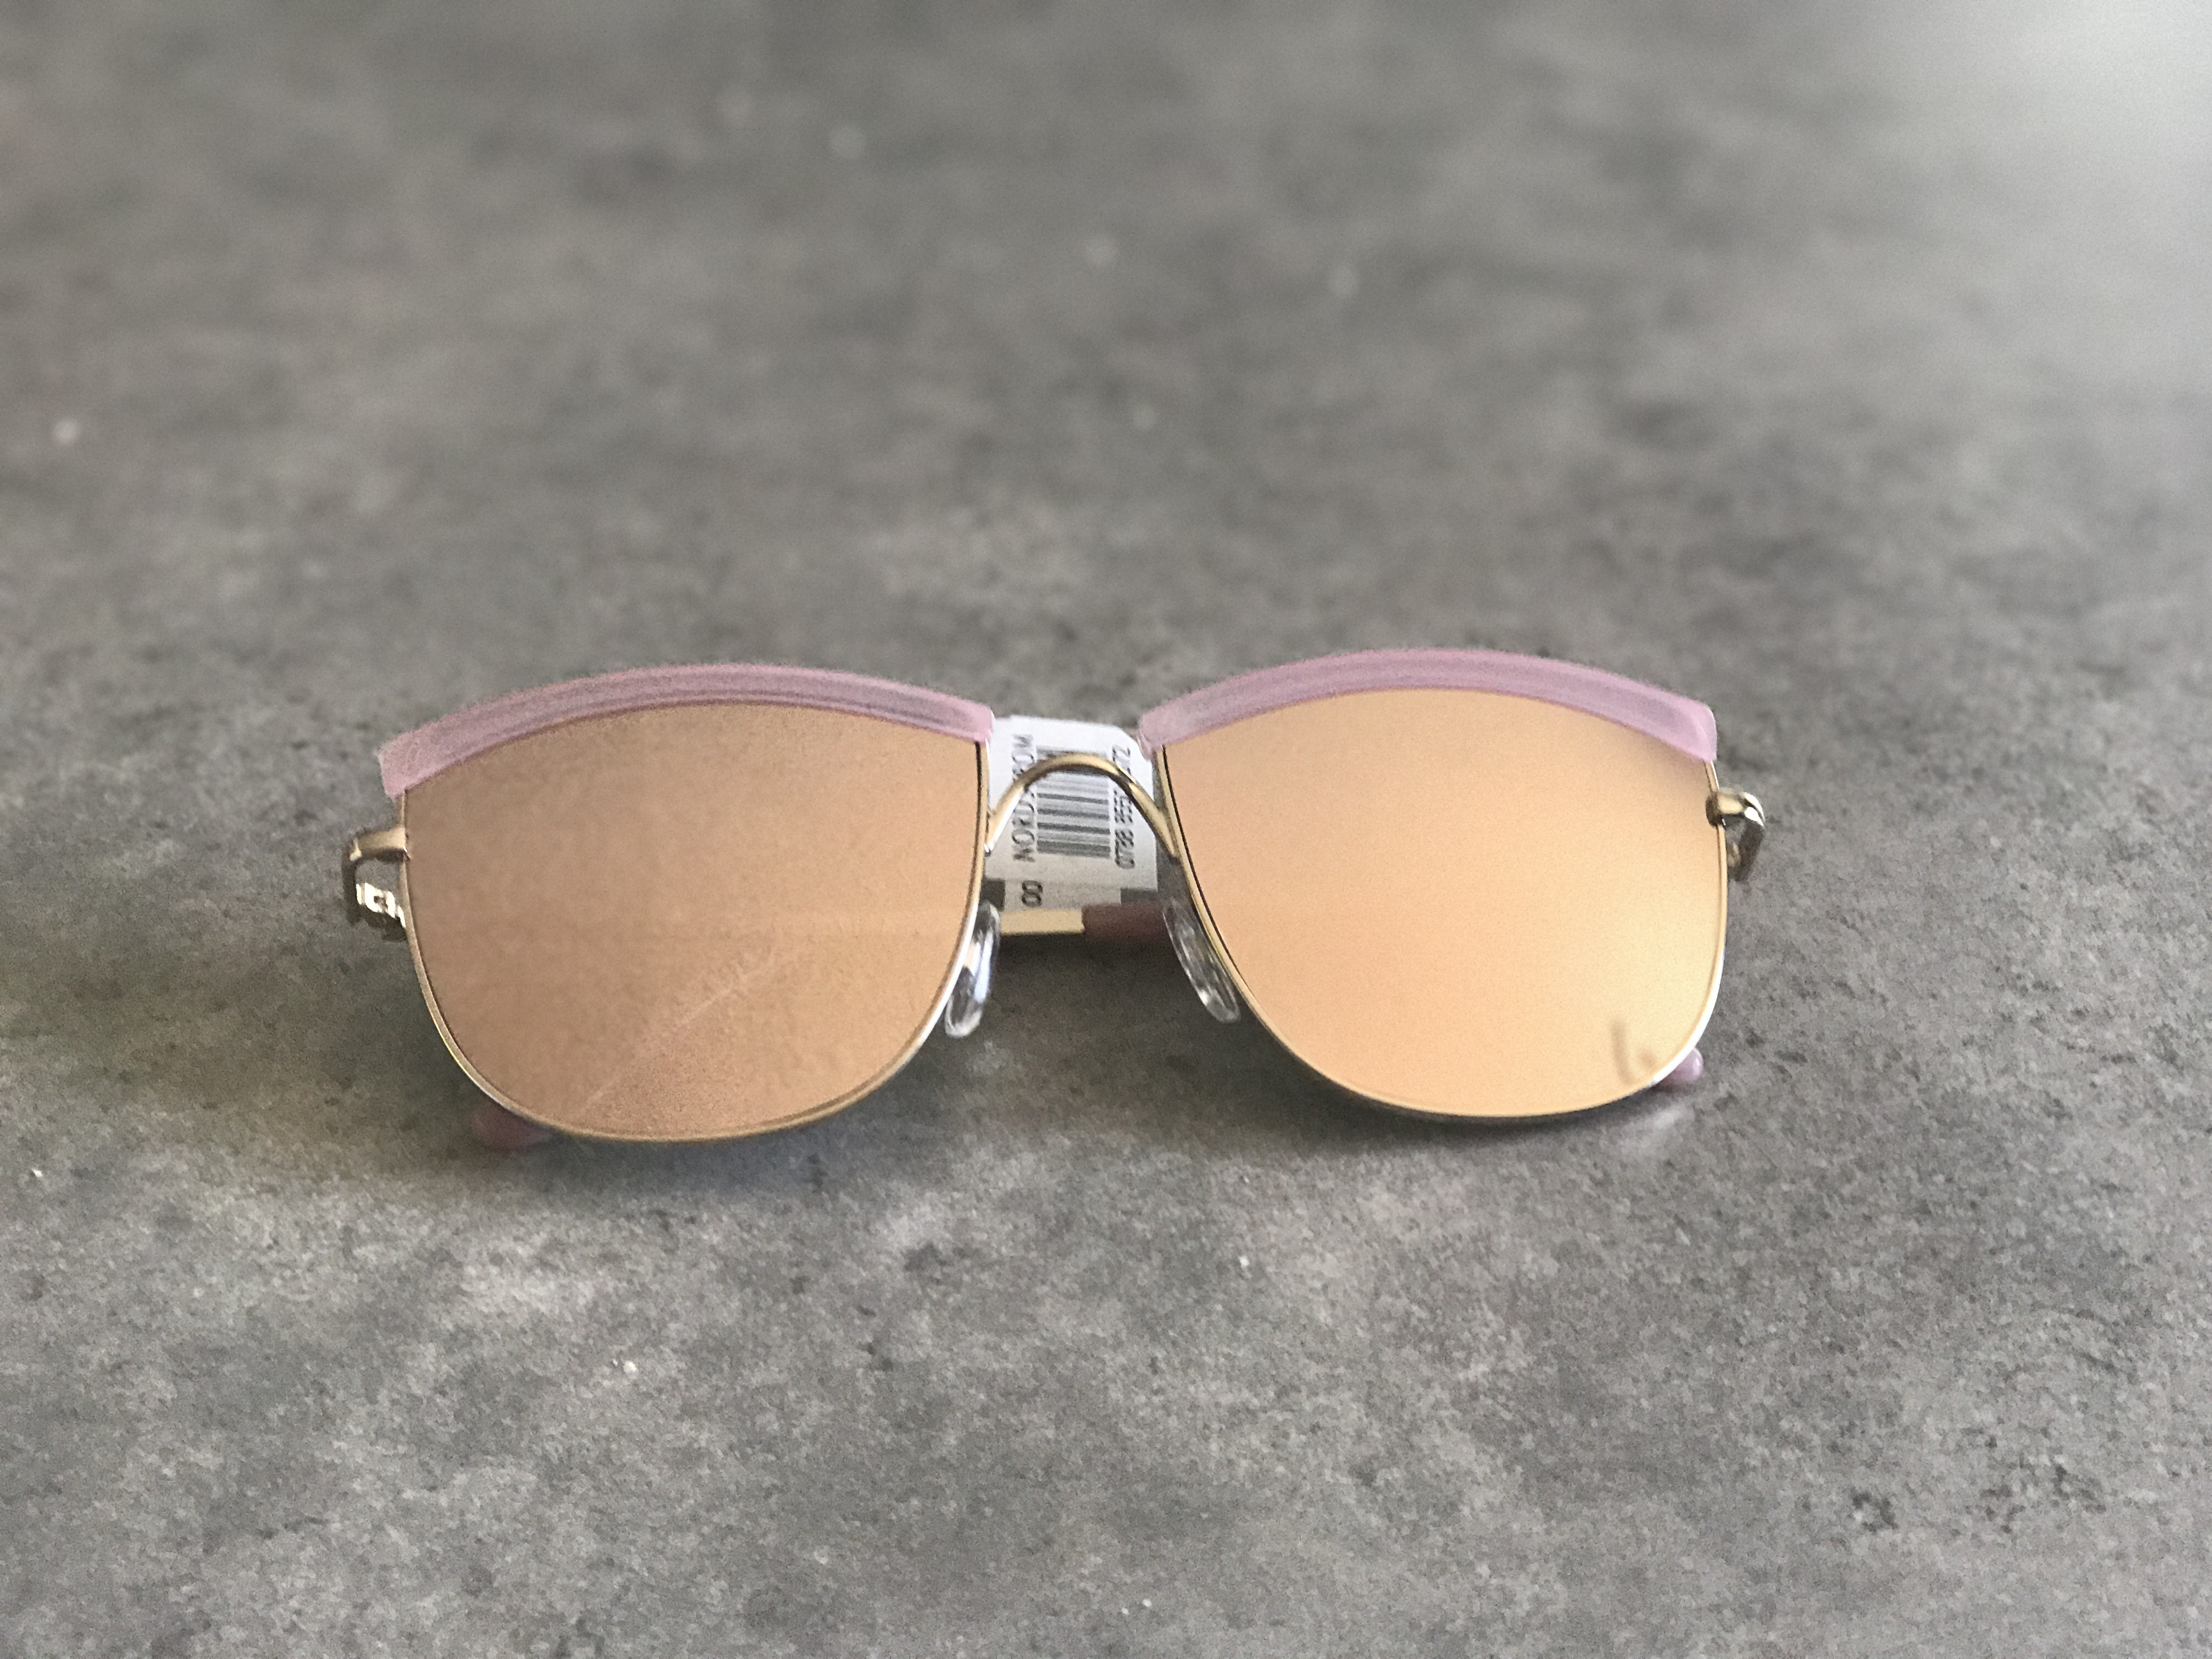 BP Sunglasses Nordstrom Sale